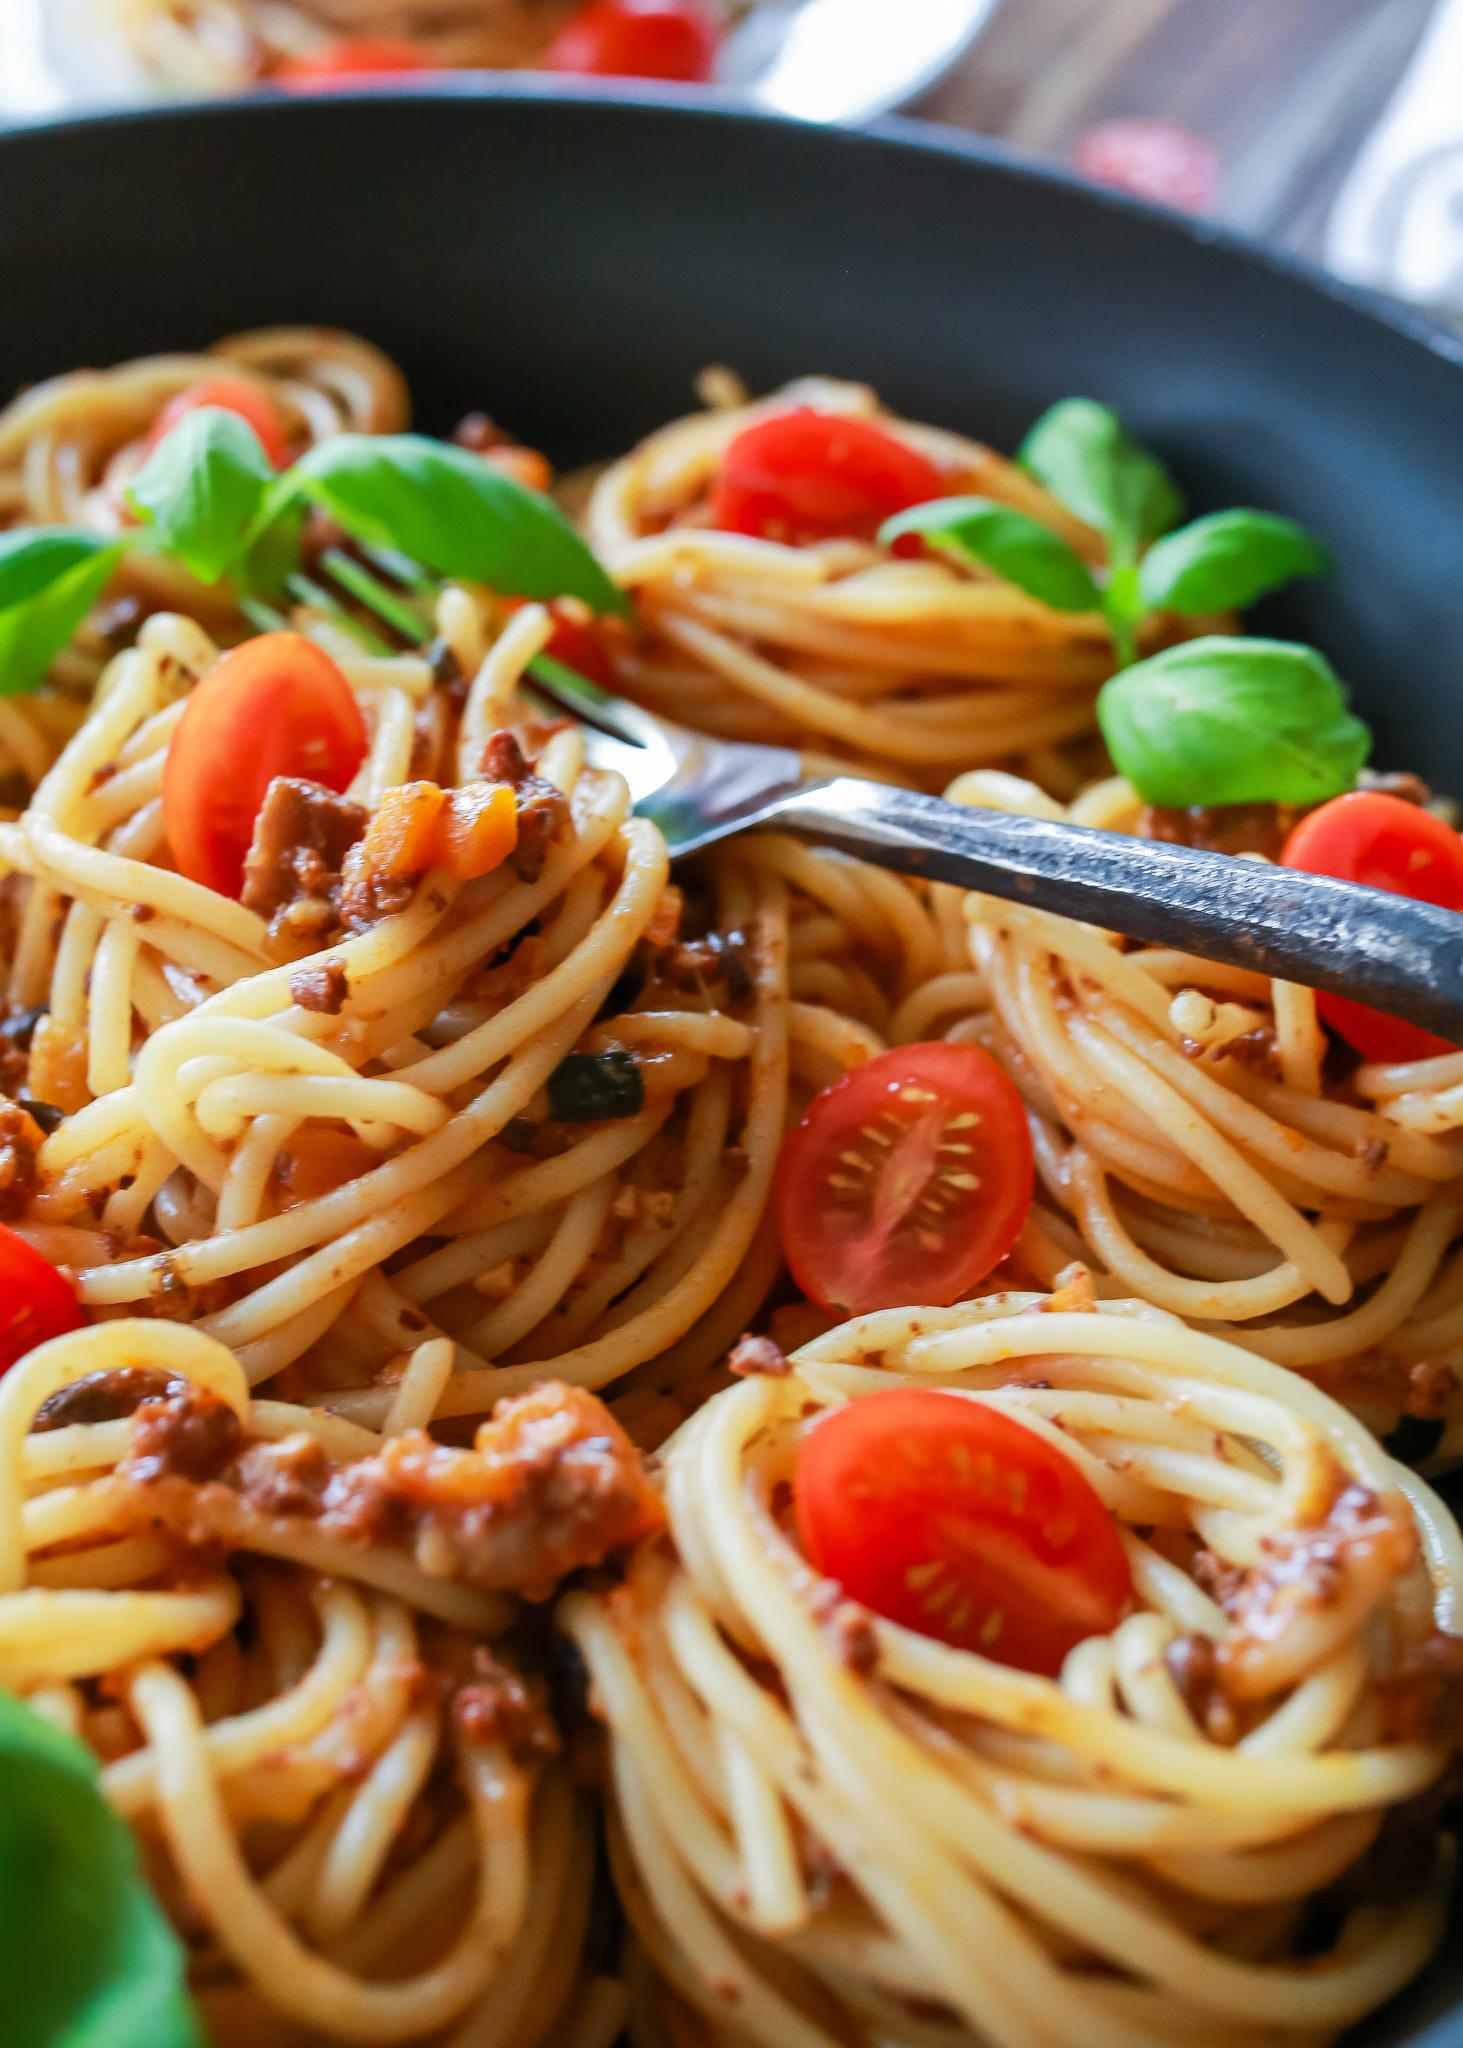 Best homemade spaghetti sauce recipe ever!